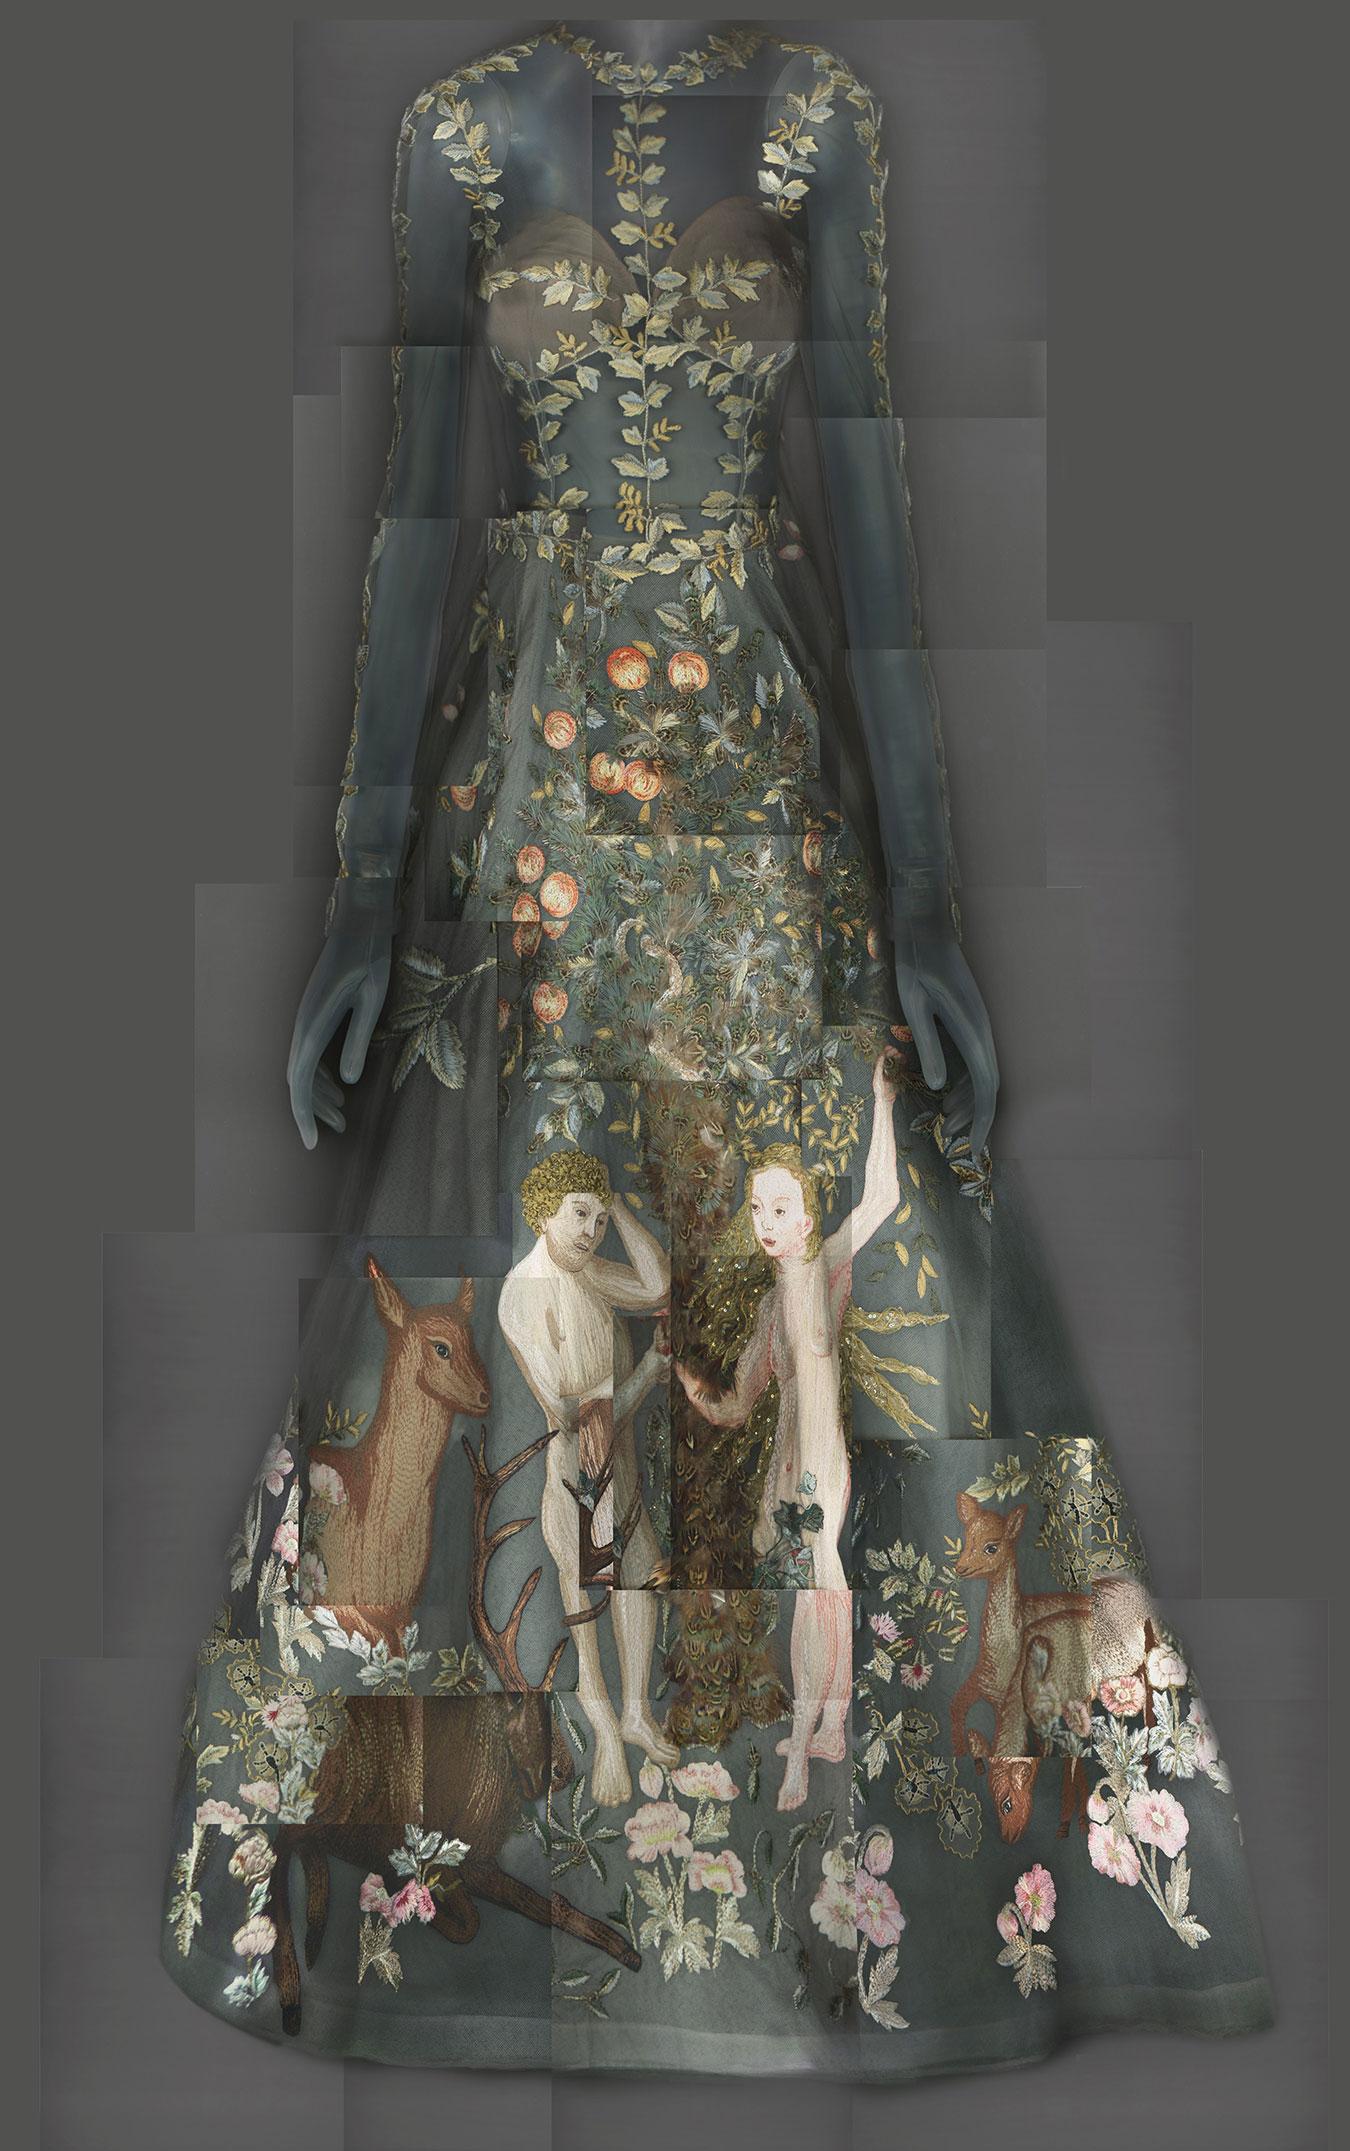 Evening Dress by Maria Grazia Chiuri and Pierpaolo Piccioli for  VALENTINO  | SS 2014 | Haute Couture | Courtesy of Valentino S.p.A. | Image courtesy of The Metropolitan Museum of Art, Digital Composite Scan by Katerina Jebb